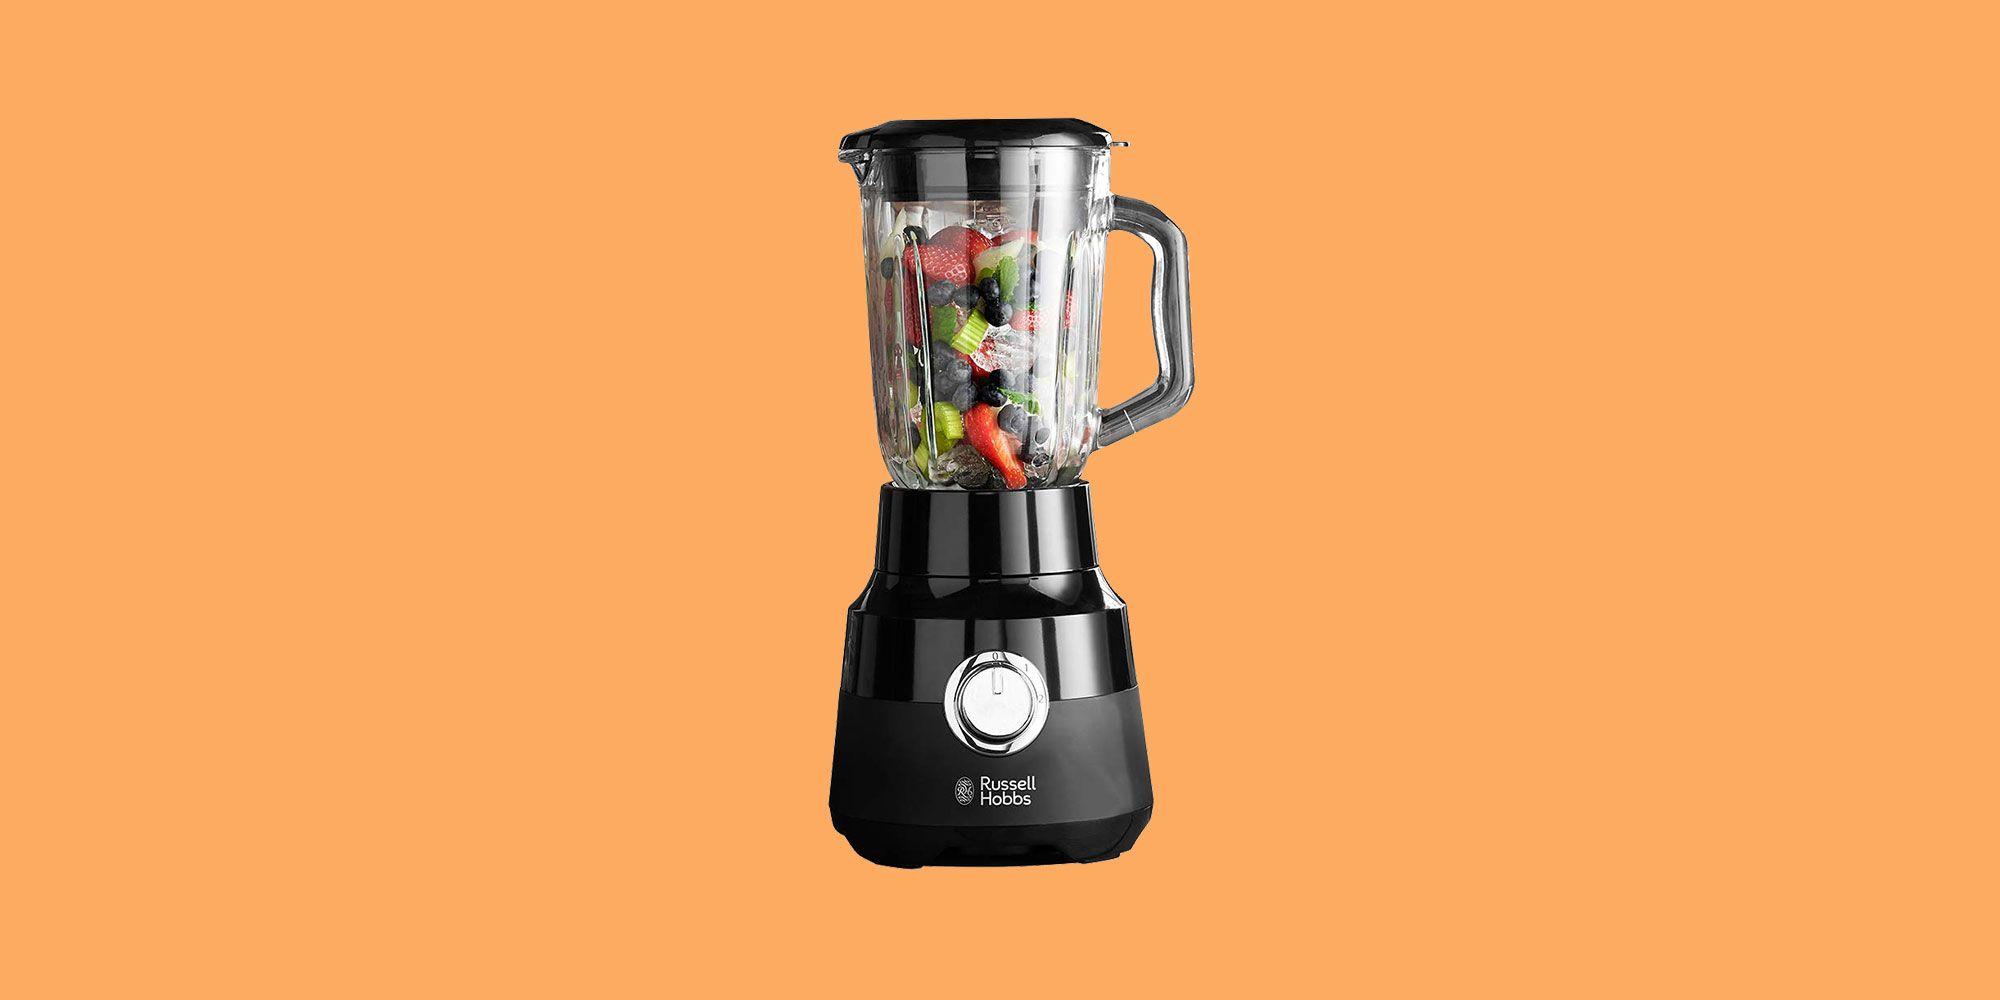 Daewoo Glass Jug Kitchen Blender SDA1088 Review